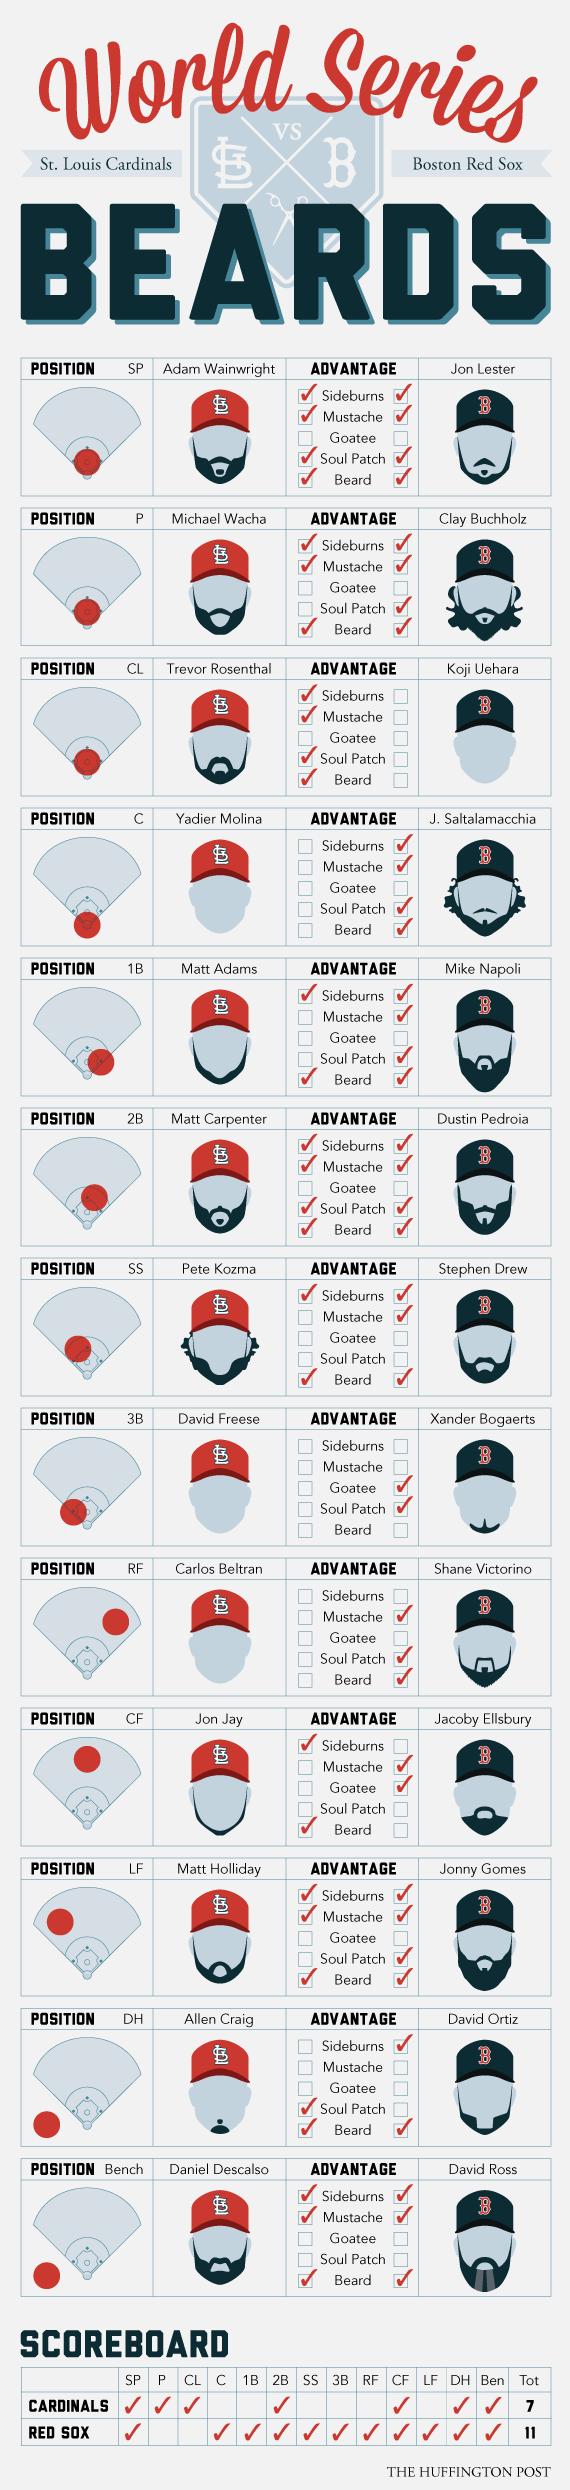 World Series Beards